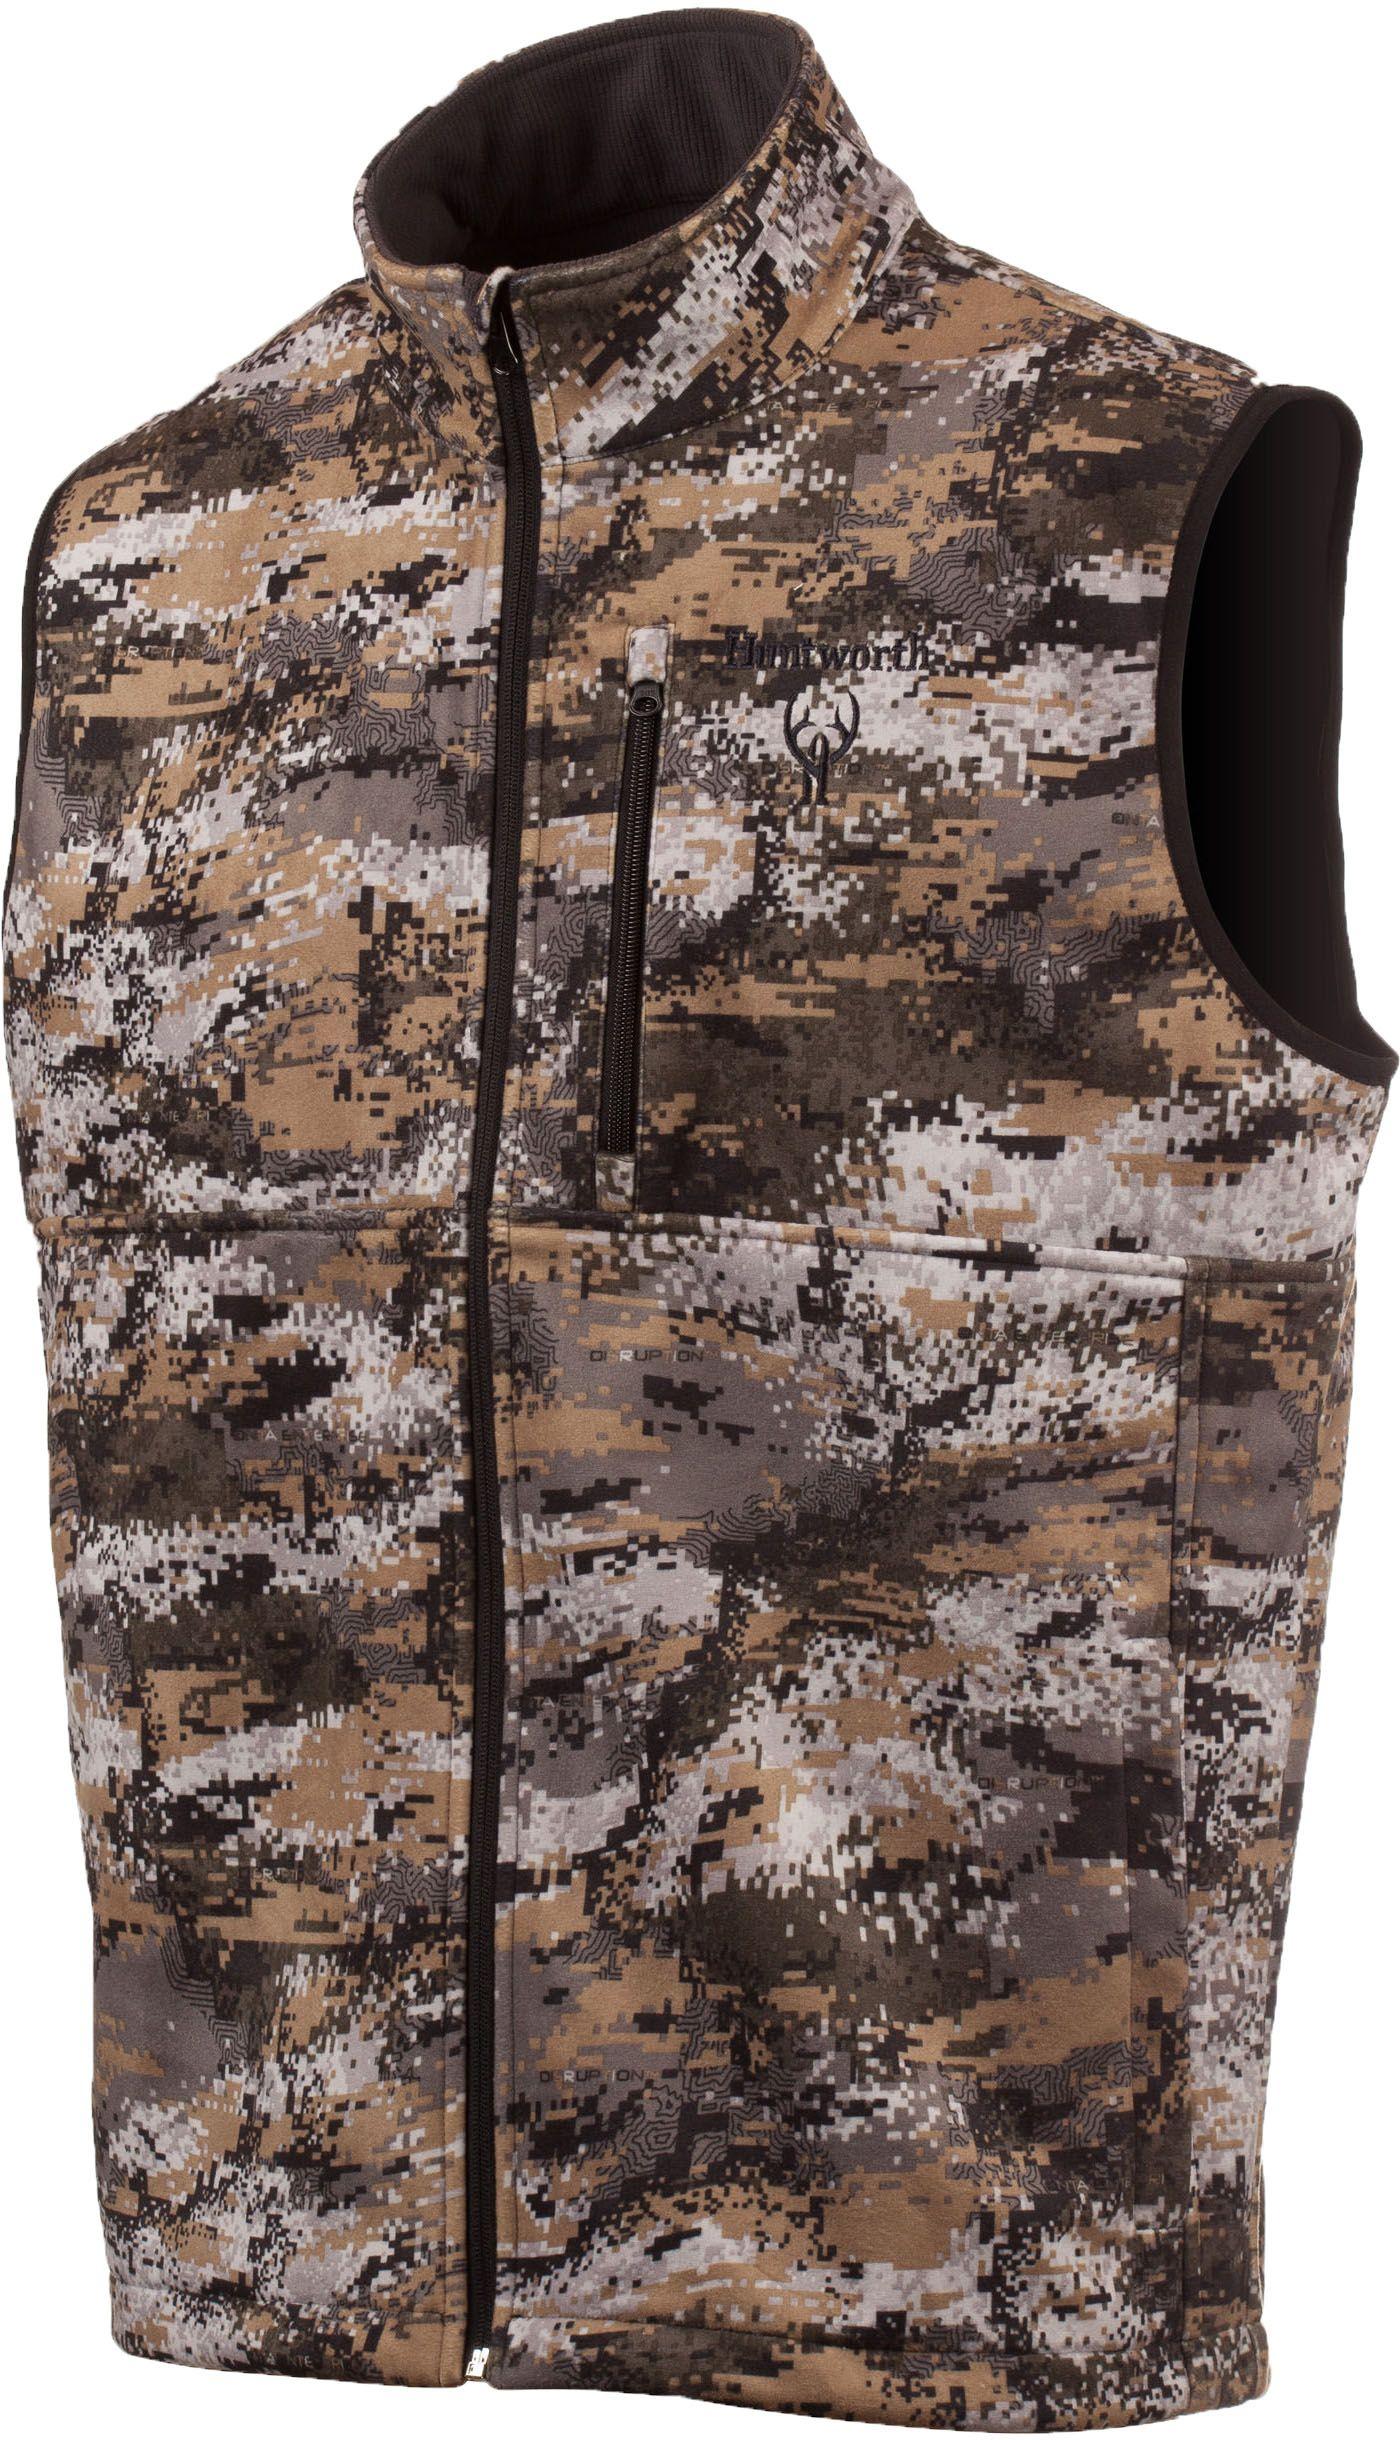 Huntworth Men's Soft Shell Hunting Vest